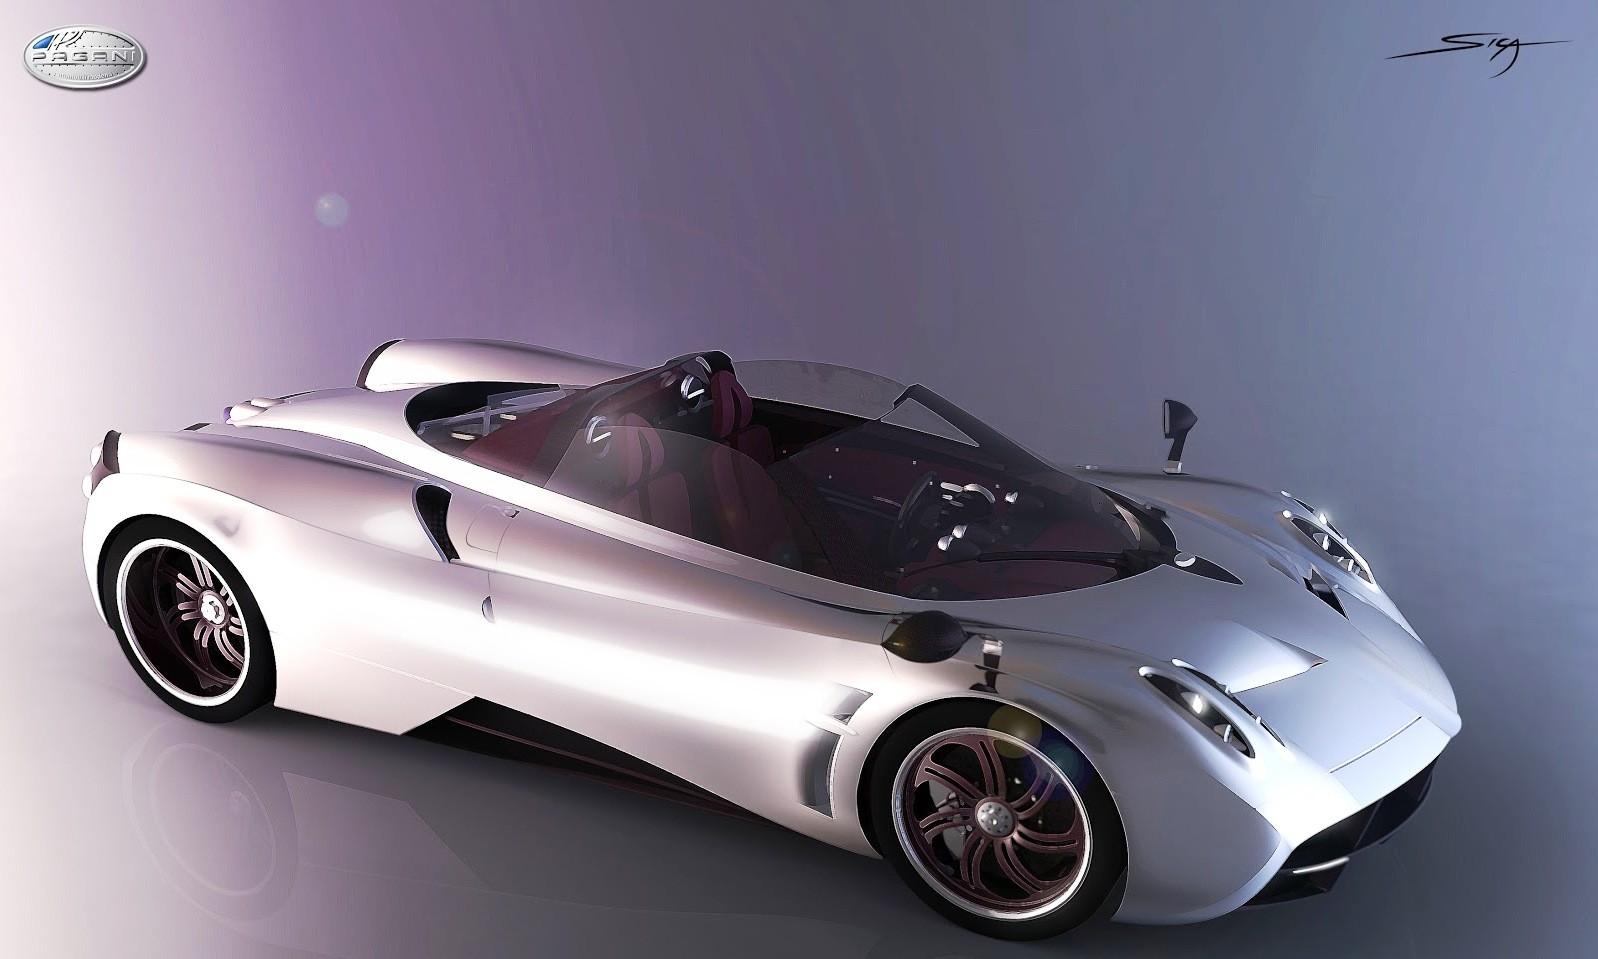 DS pagani huayra roadster : Car-Revs-Daily.com Design Analysis -- PAGANI HUAYRA ROADSTER by ...